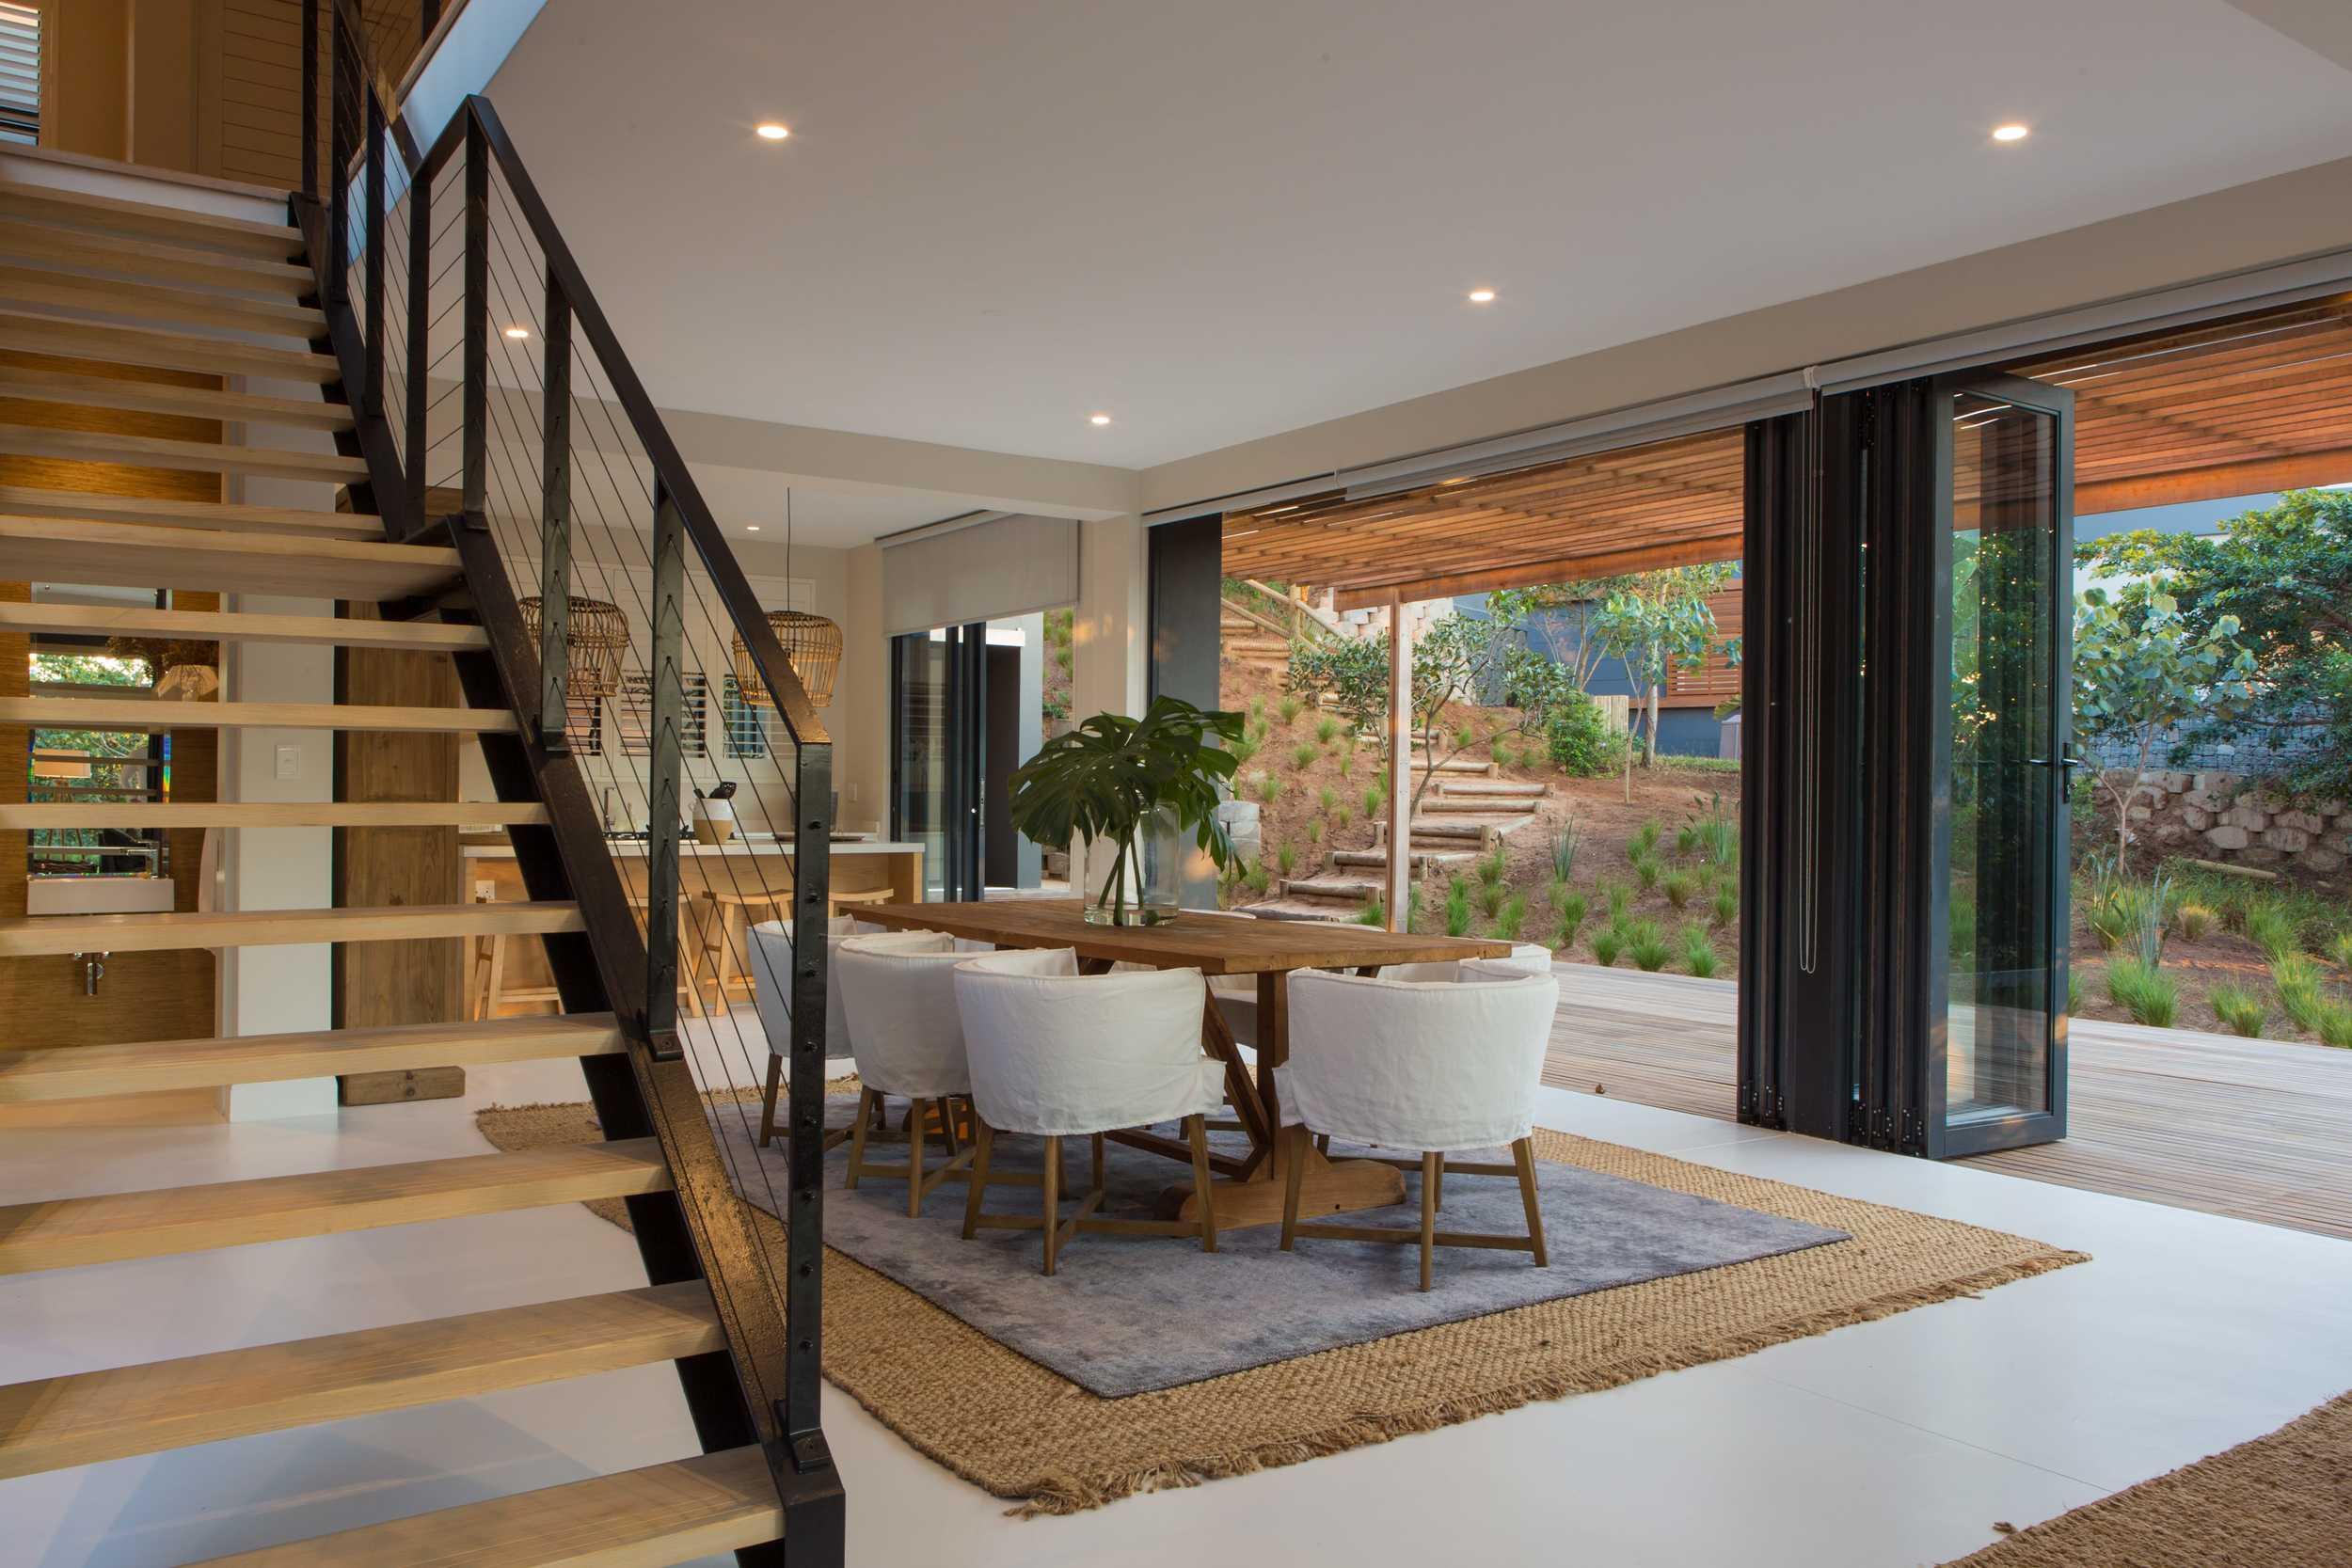 julia-rutherfoord-architect-dunkirk-estate-2015-03.jpg